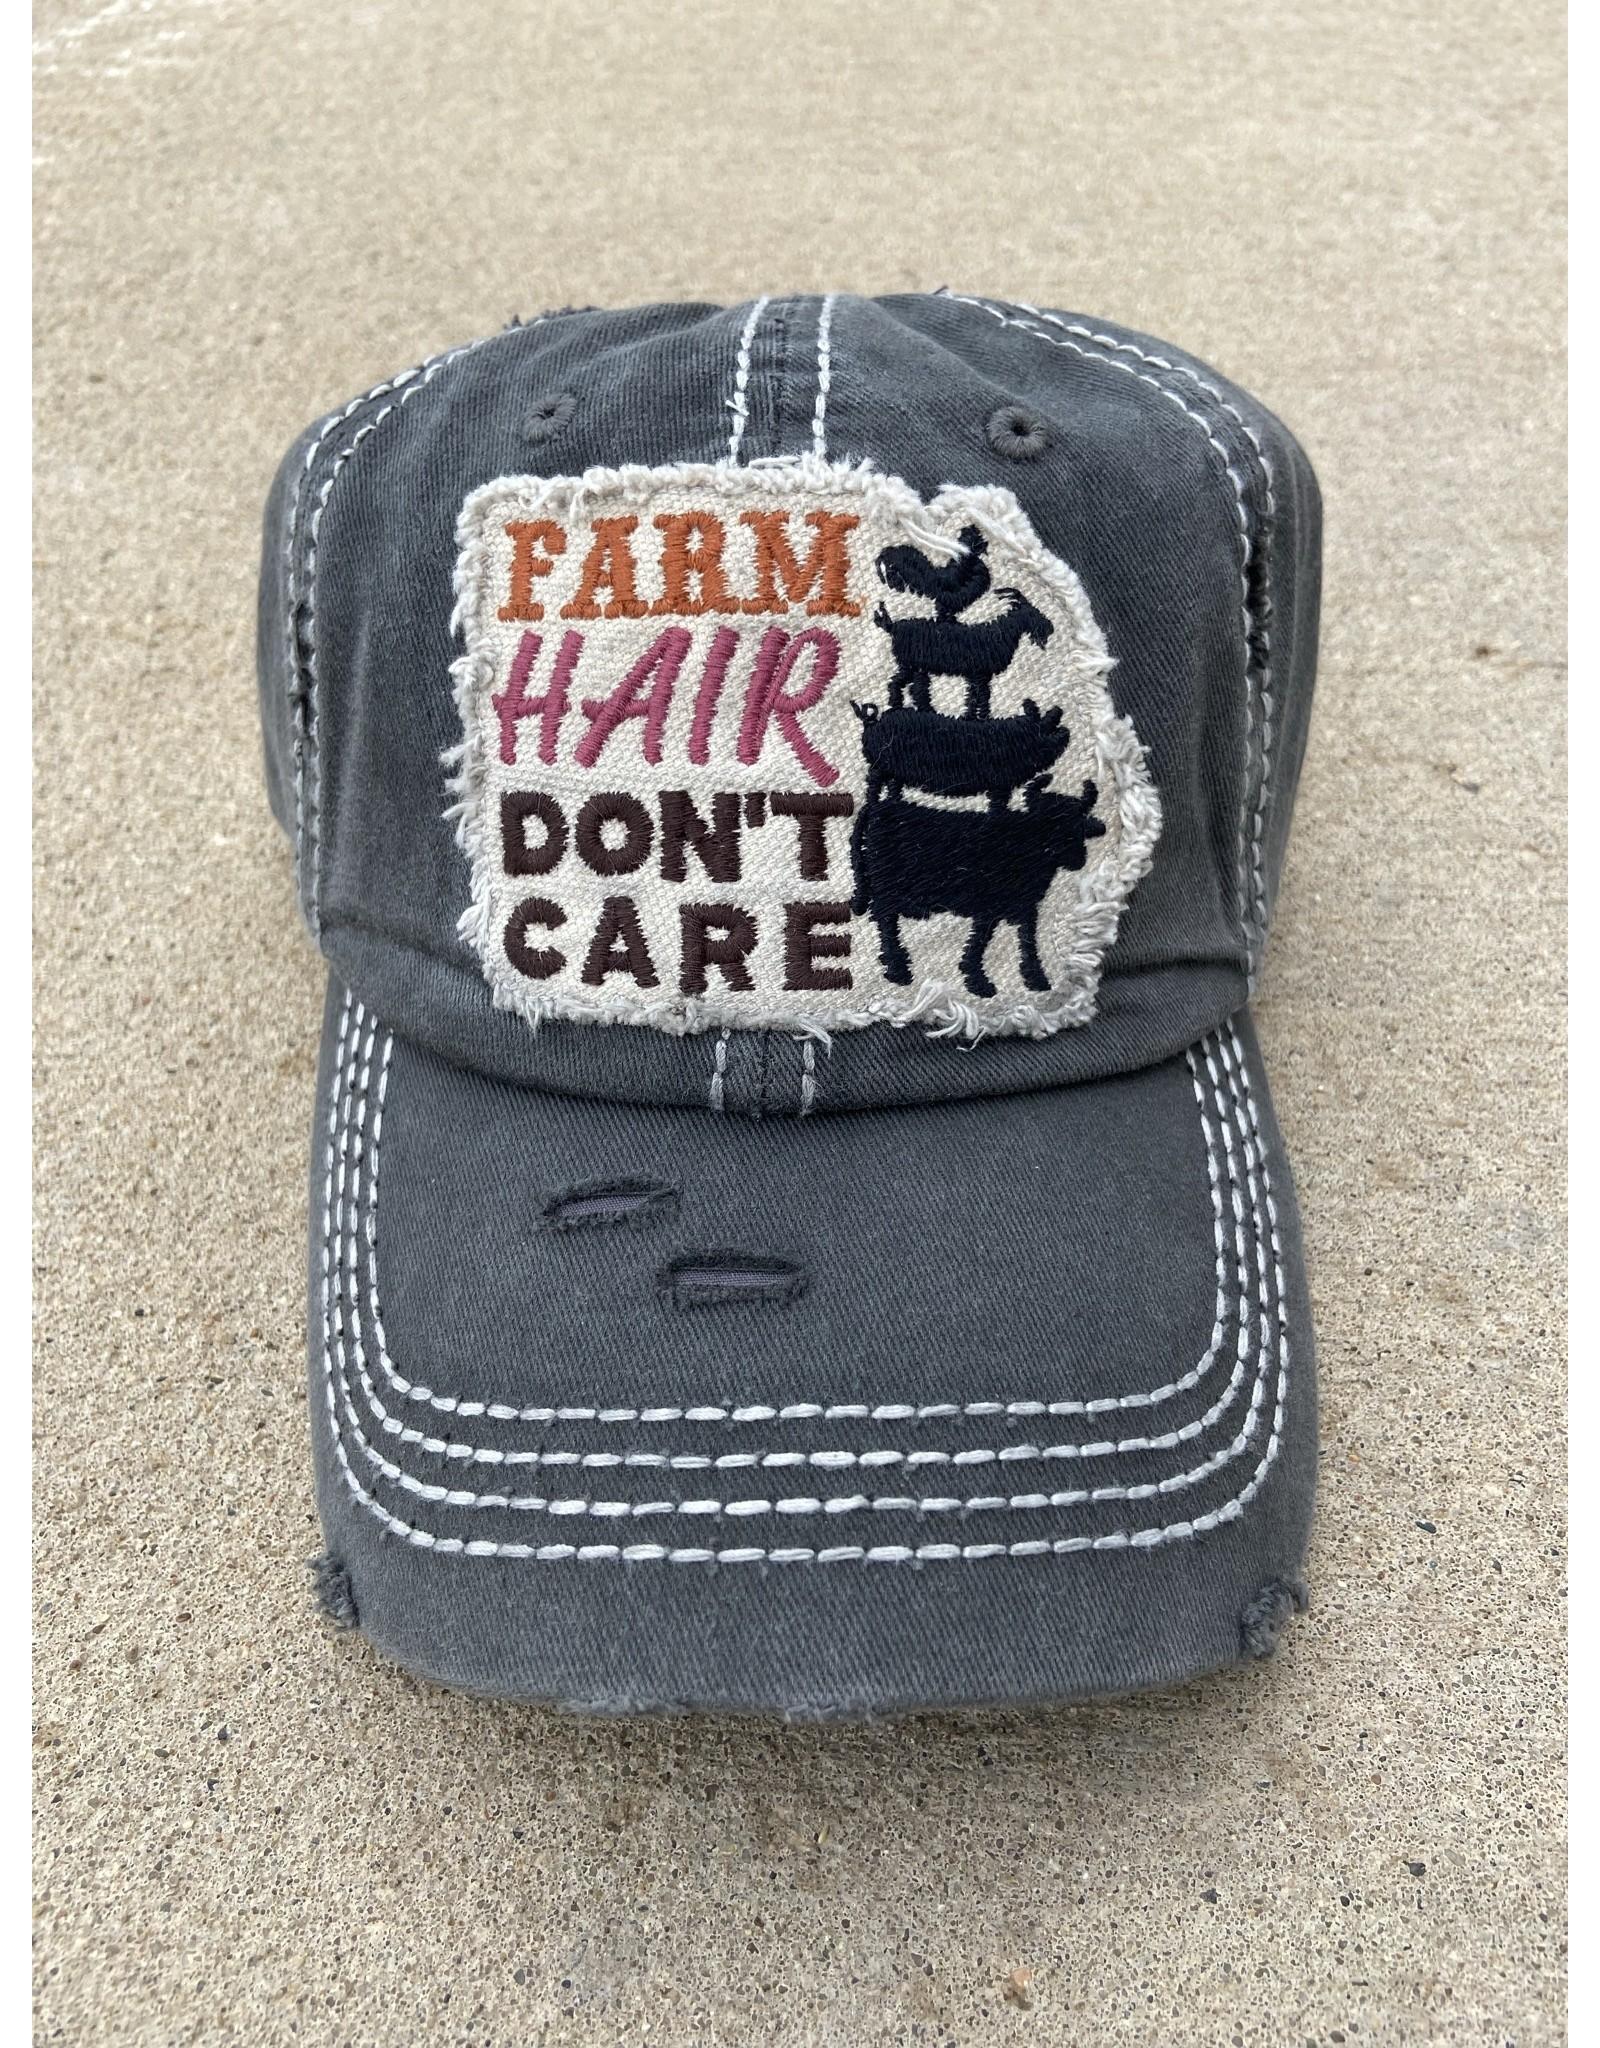 LATA Statement Hat